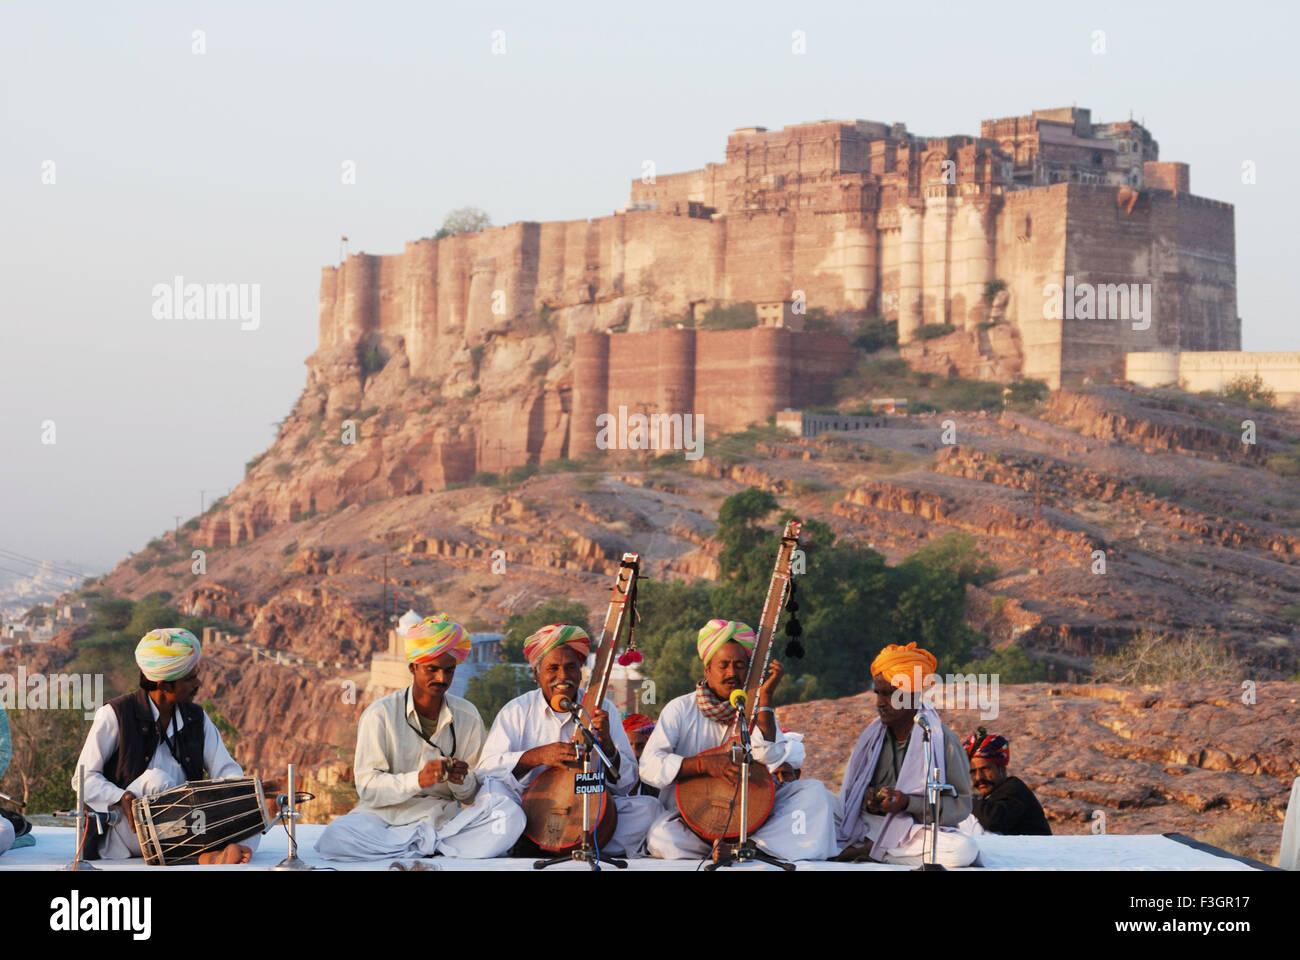 Folk music back drop Mehrangarh fort ; Jodhpur ; Rajasthan ; India - Stock Image